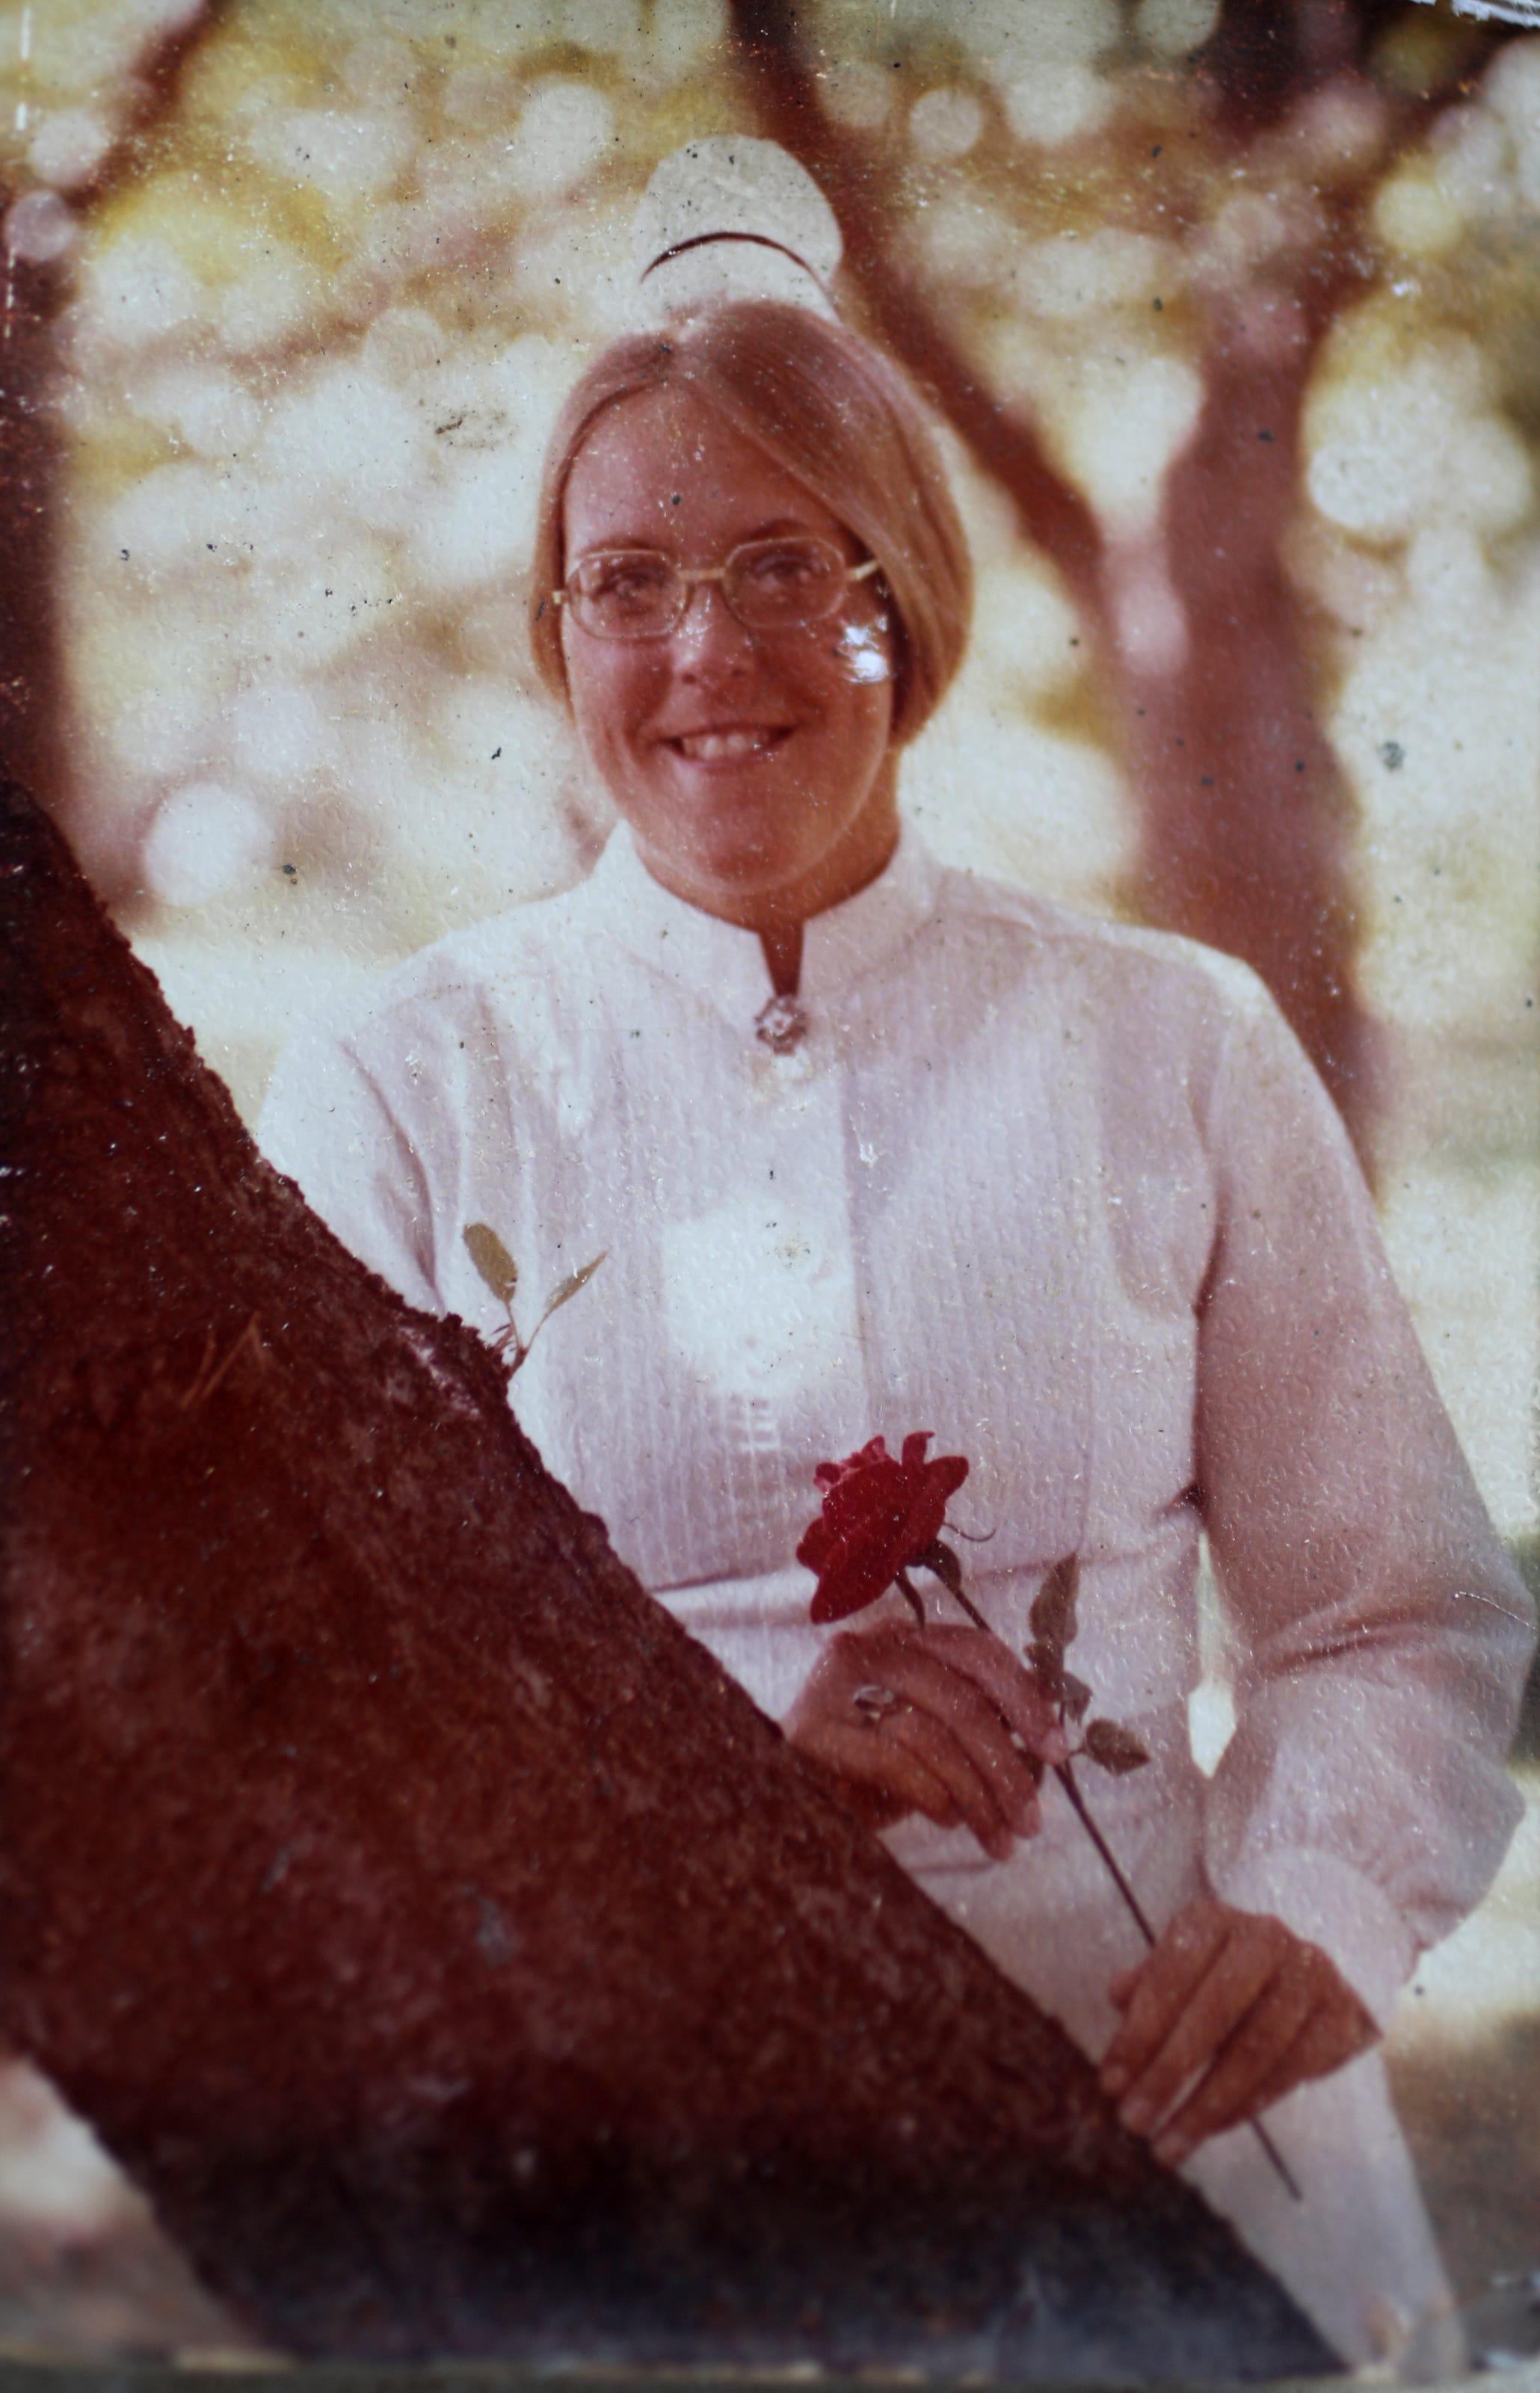 Barbara Birchenough is shown in a photo from when she graduated nursing school.